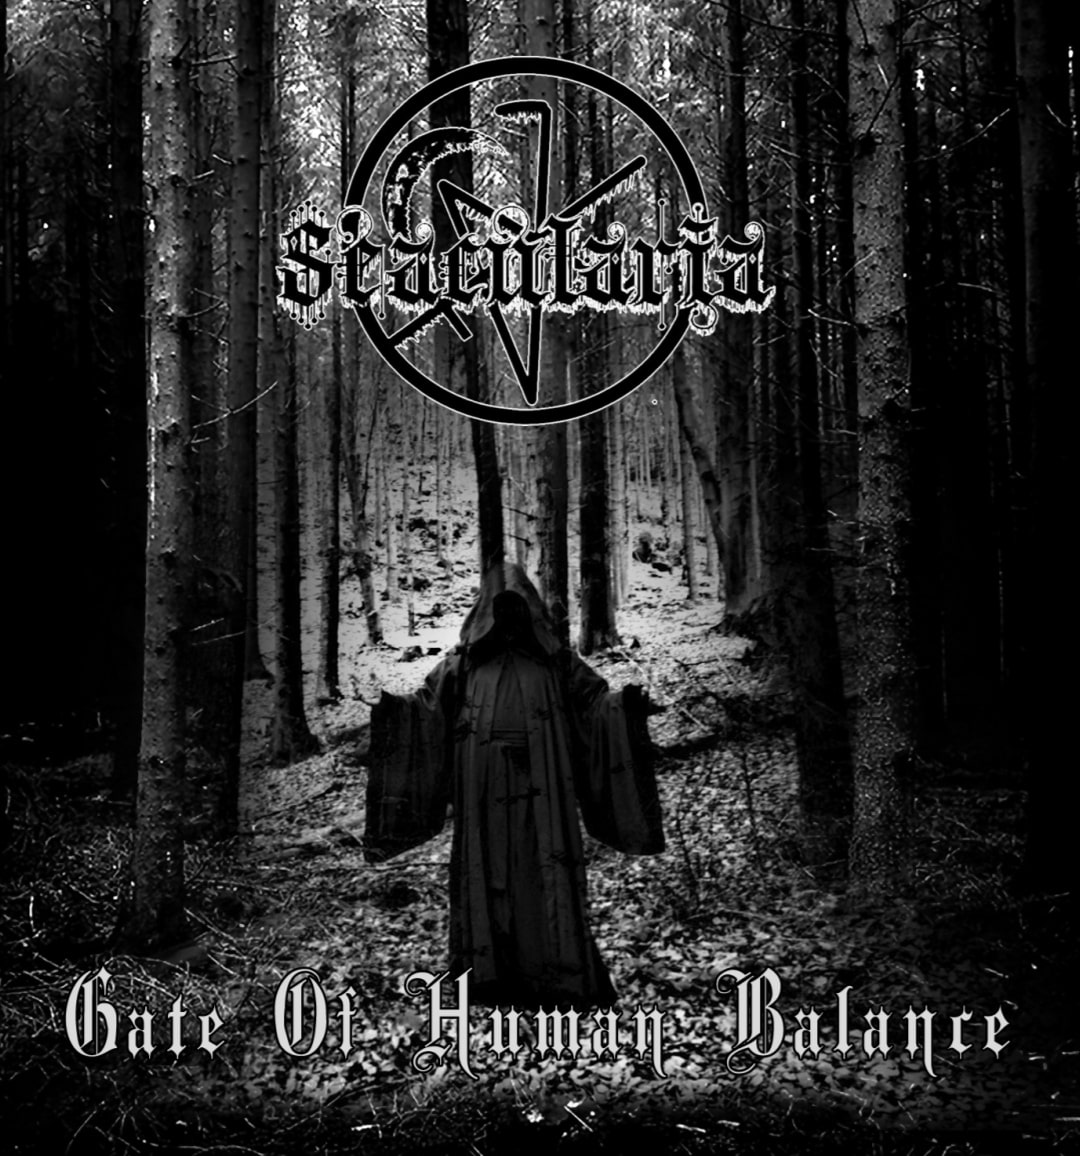 seacularia – gate of human balance [ep]